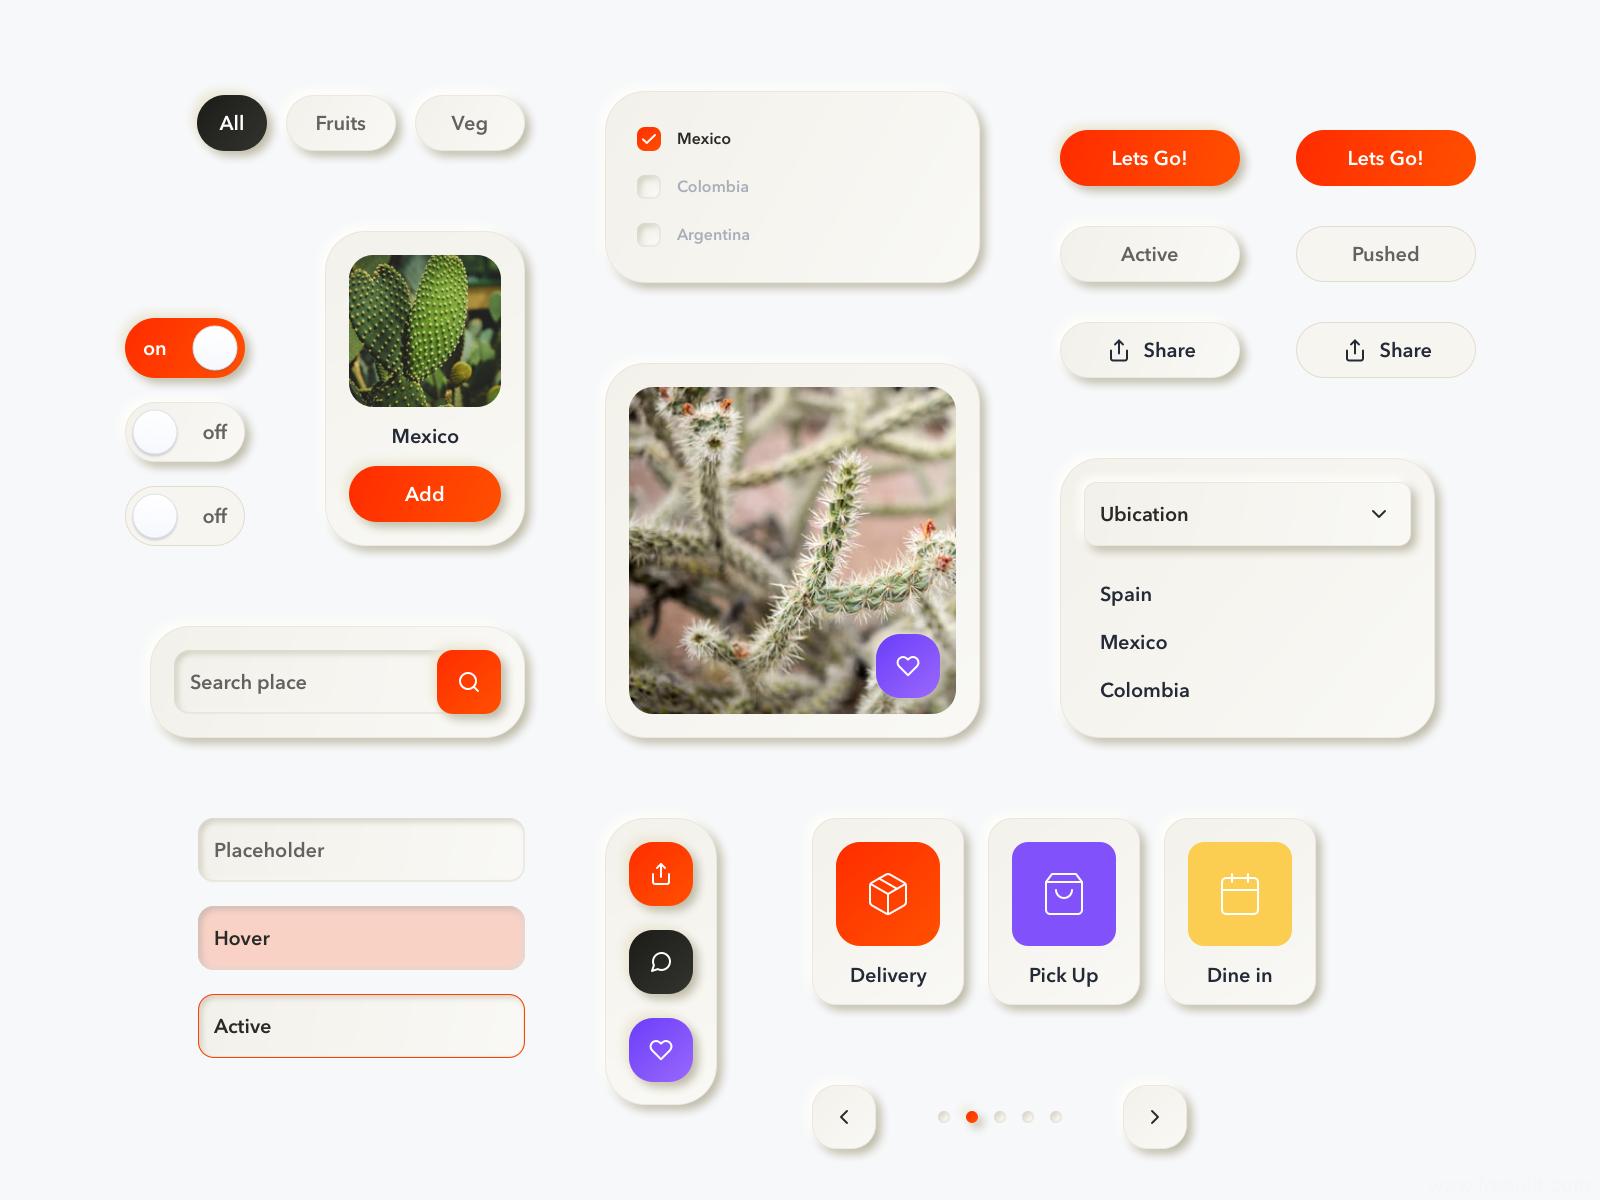 Neumorphic新拟物风格app ui kit .sketch源文件下载,UI源文件下载